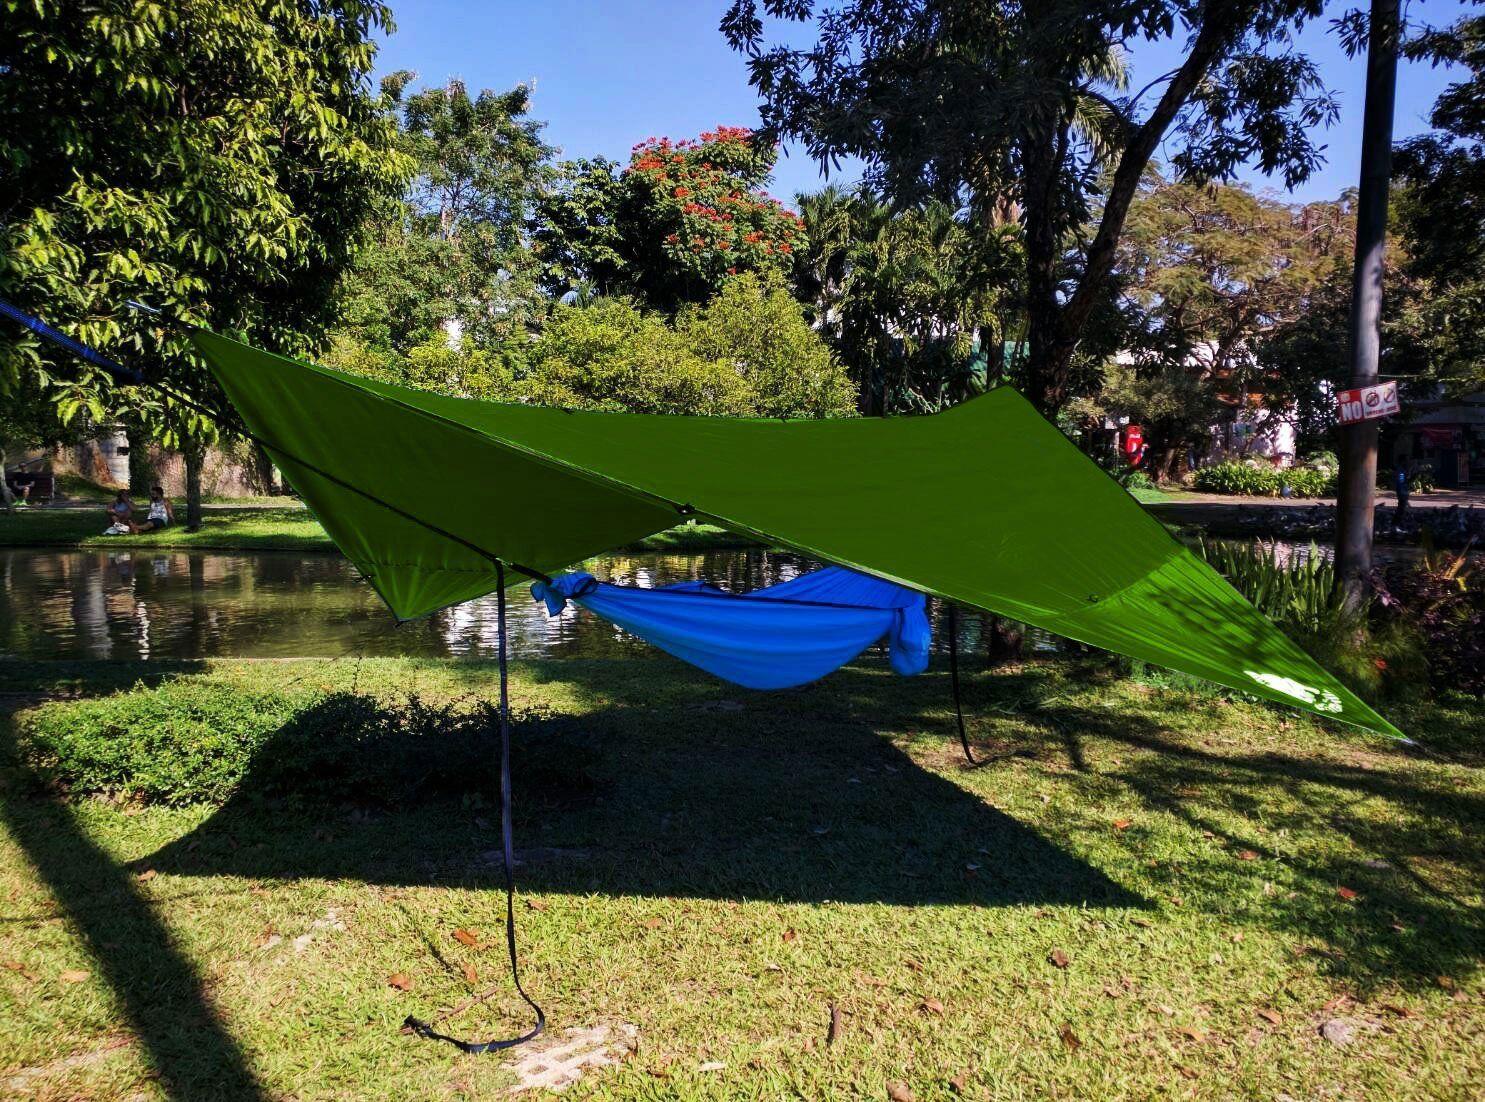 amazon     chill gorilla 12 u0027 pro rain fly green waterproof tent tarp amazon     chill gorilla 12 u0027 pro rain fly green waterproof tent      rh   pinterest